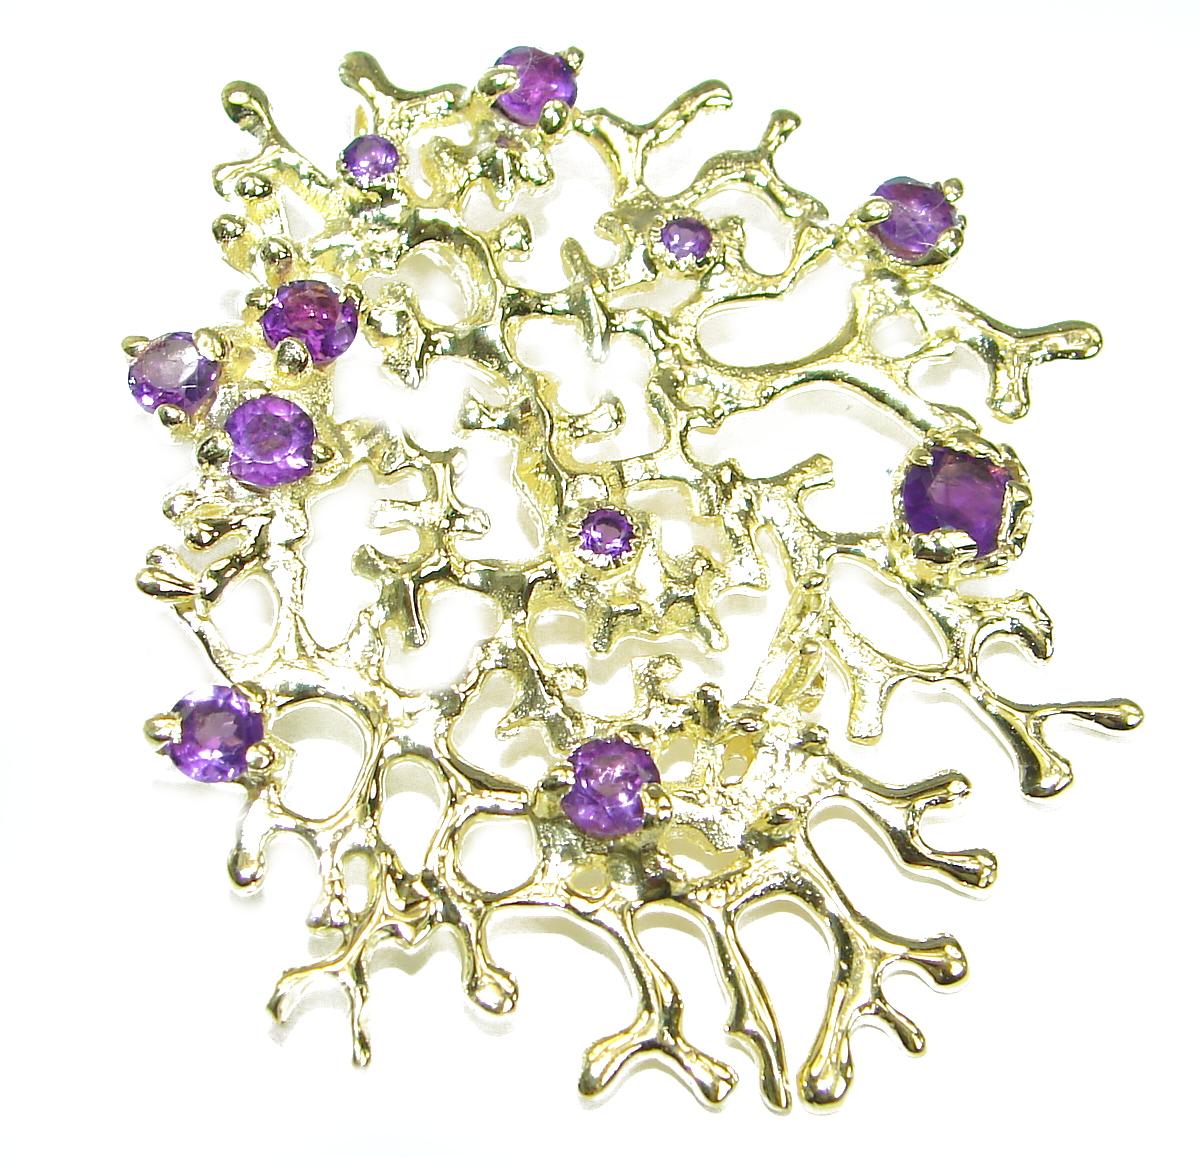 True Beauty Amethyst 14K Gold .925 Sterling Silver handcrafted  Pendant